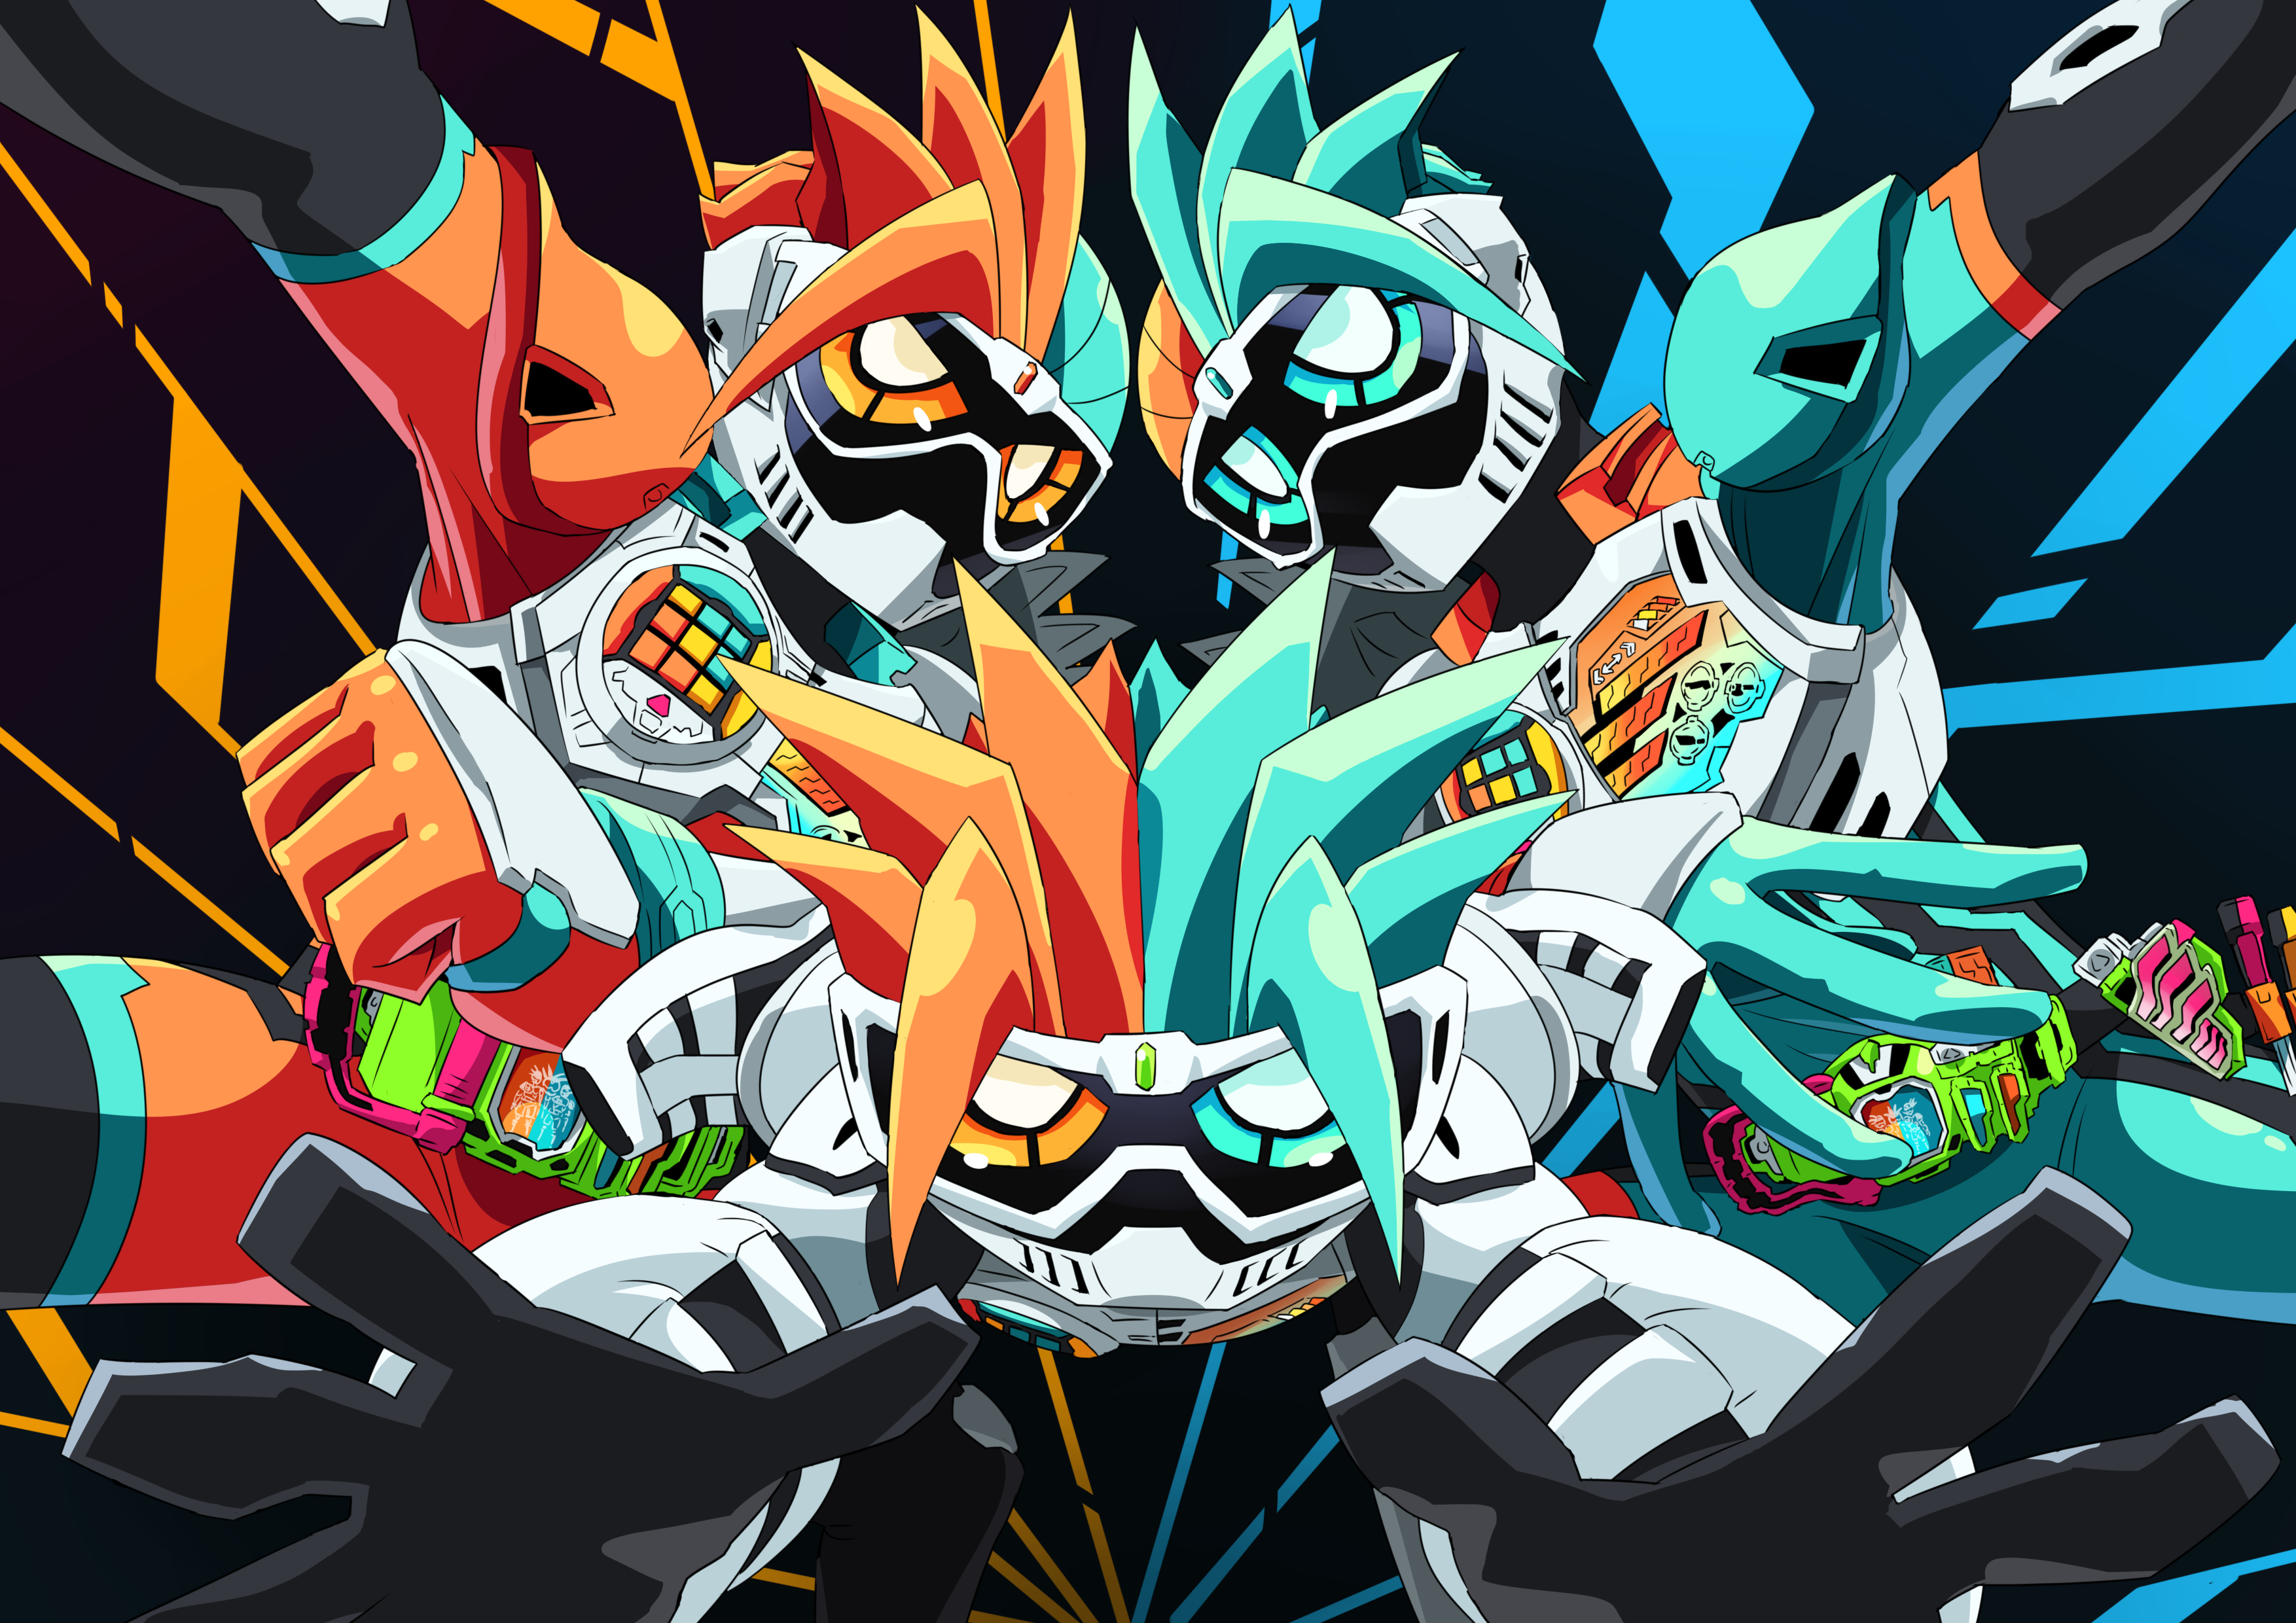 Kamen Rider Ex Aid Kamen Rider And 1 More Drawn By Otokamu Danbooru